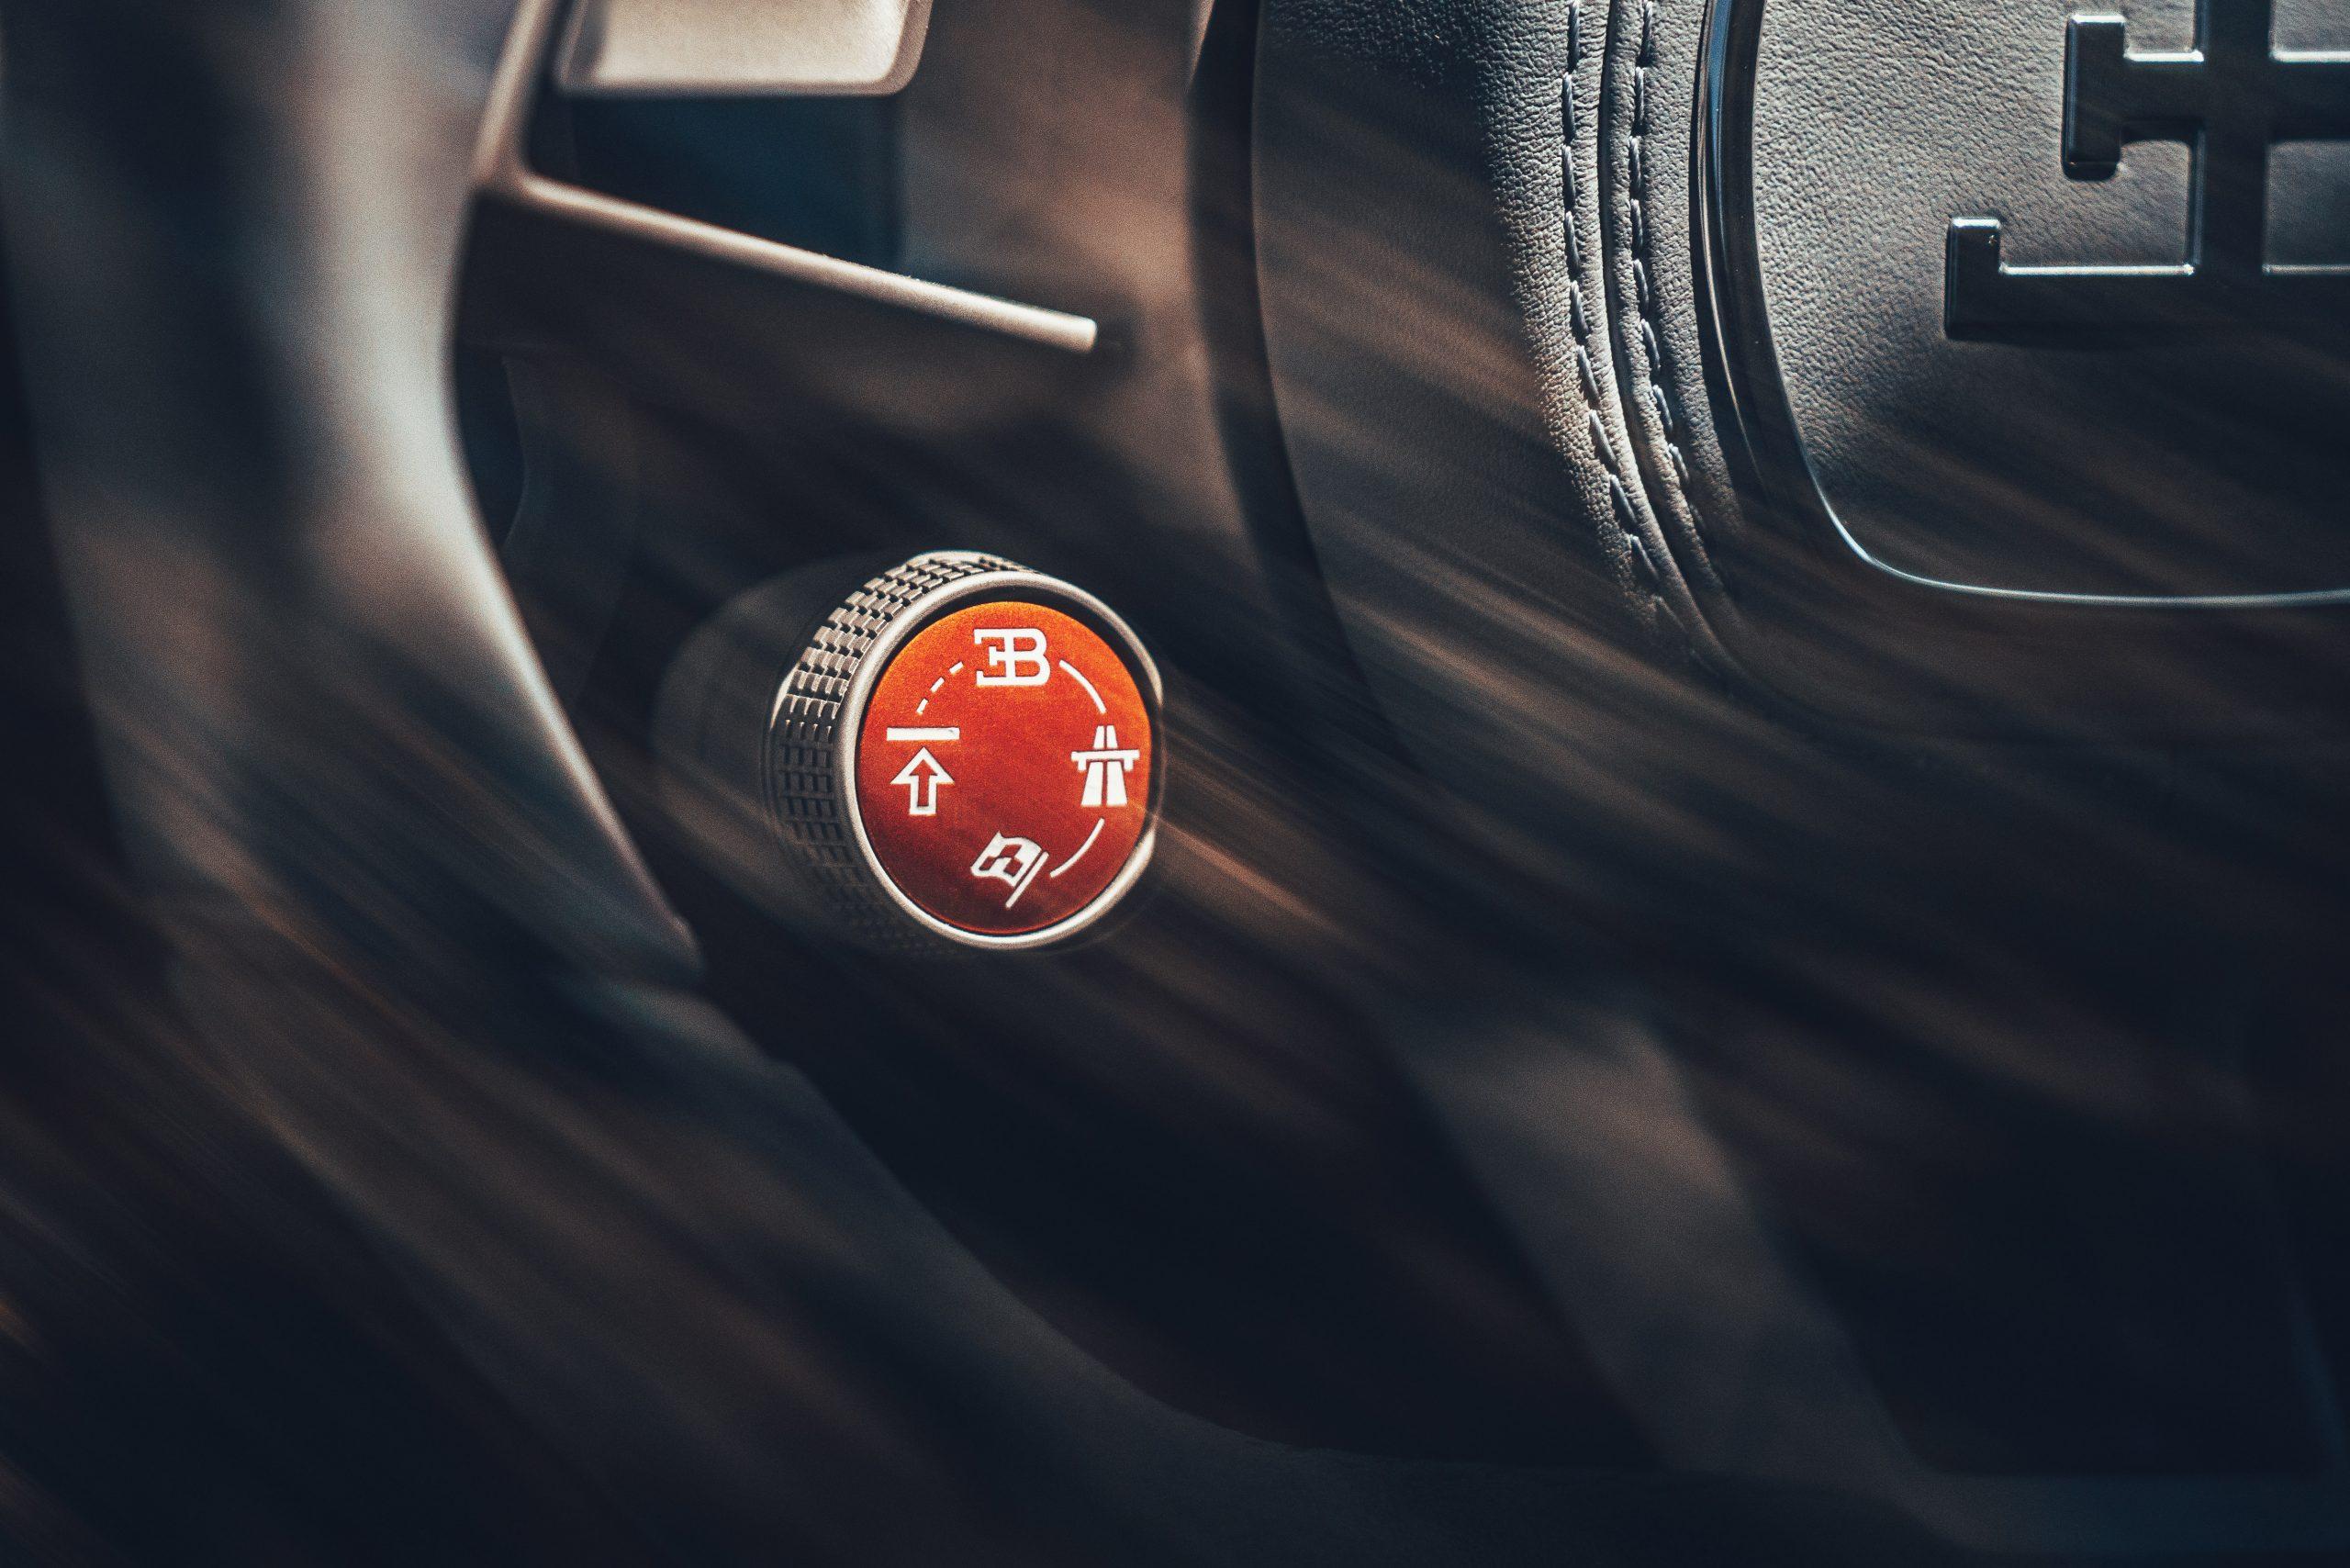 Bugatti Divo driving mode detail steering wheel